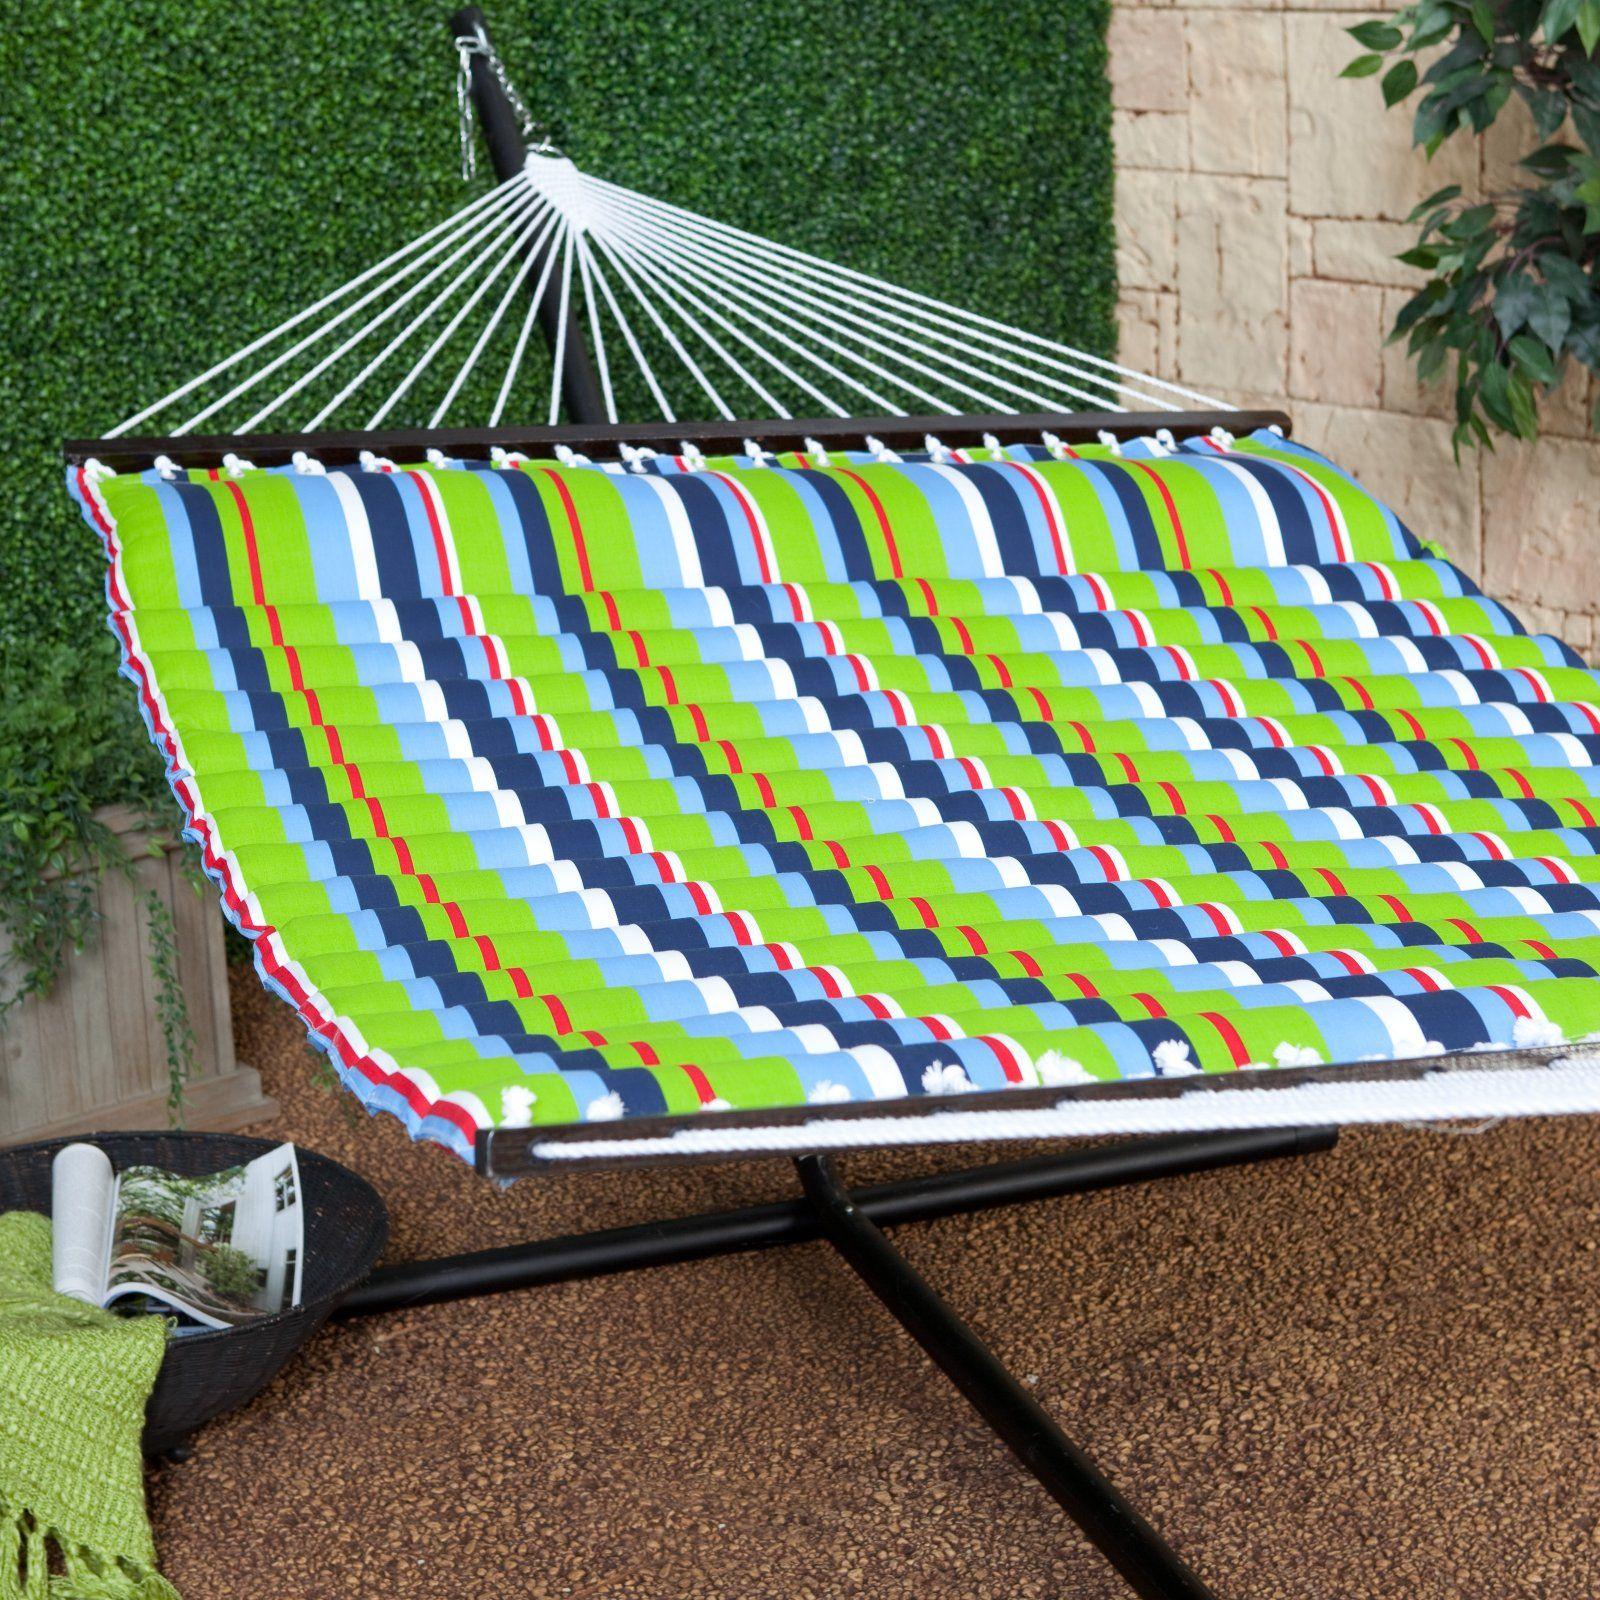 island bay brights pillow top hammock with stand   hammock with stand sets at hammocks island bay brights pillow top hammock with stand   hammock with      rh   pinterest